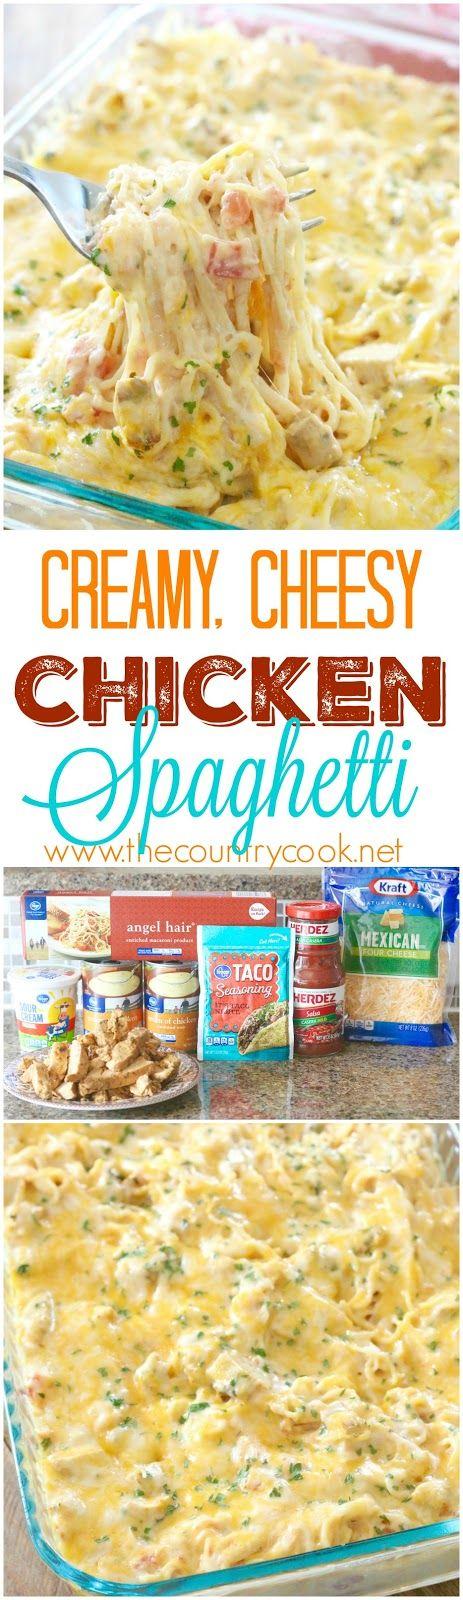 The Country Cook: Creamy, Cheesy Chicken Spaghetti